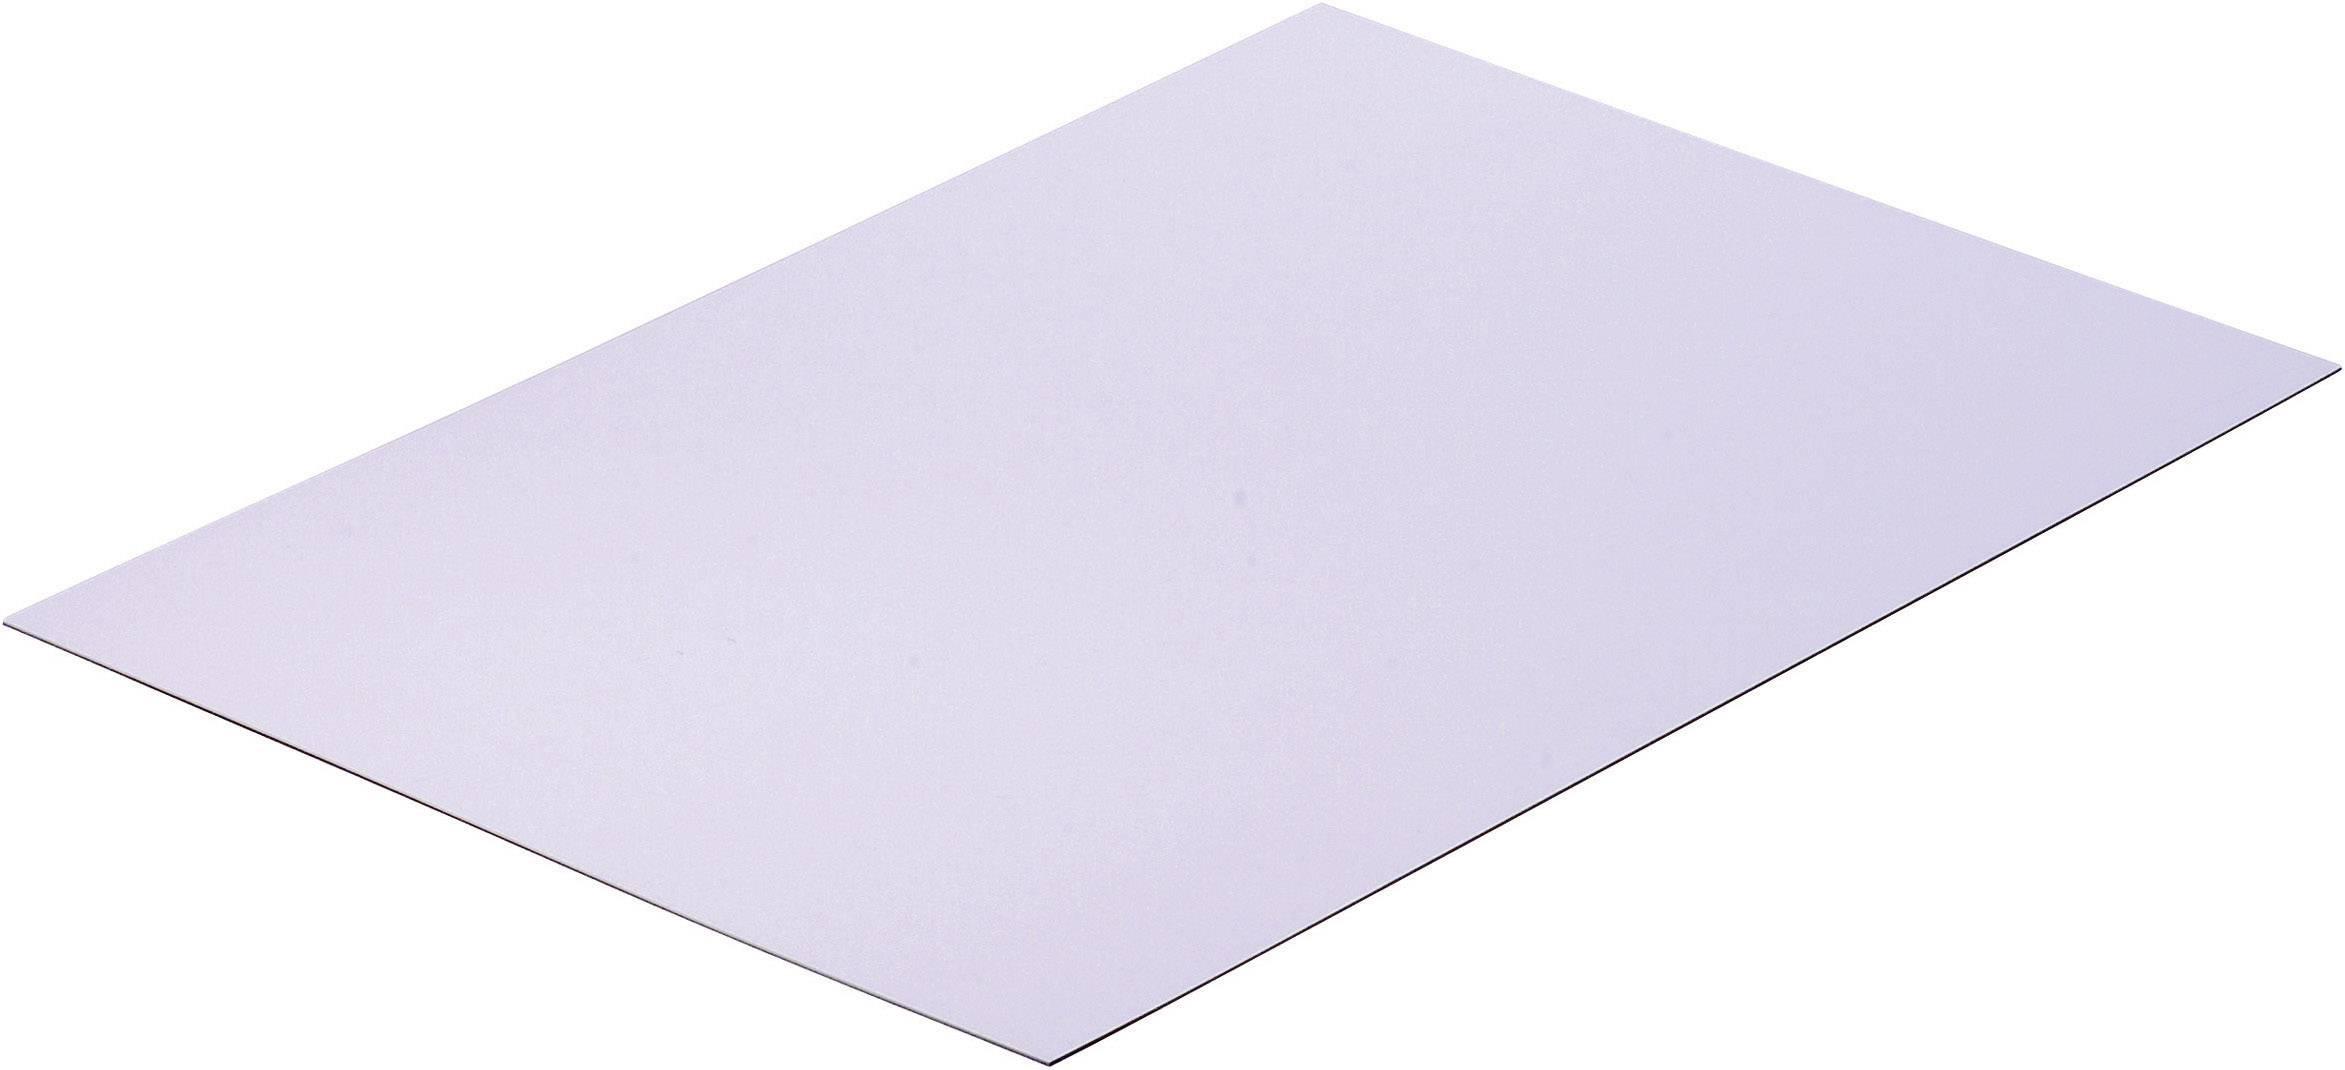 Polystyrenová deska bílá Modelcraft, 330 x 230 x 1,0 mm